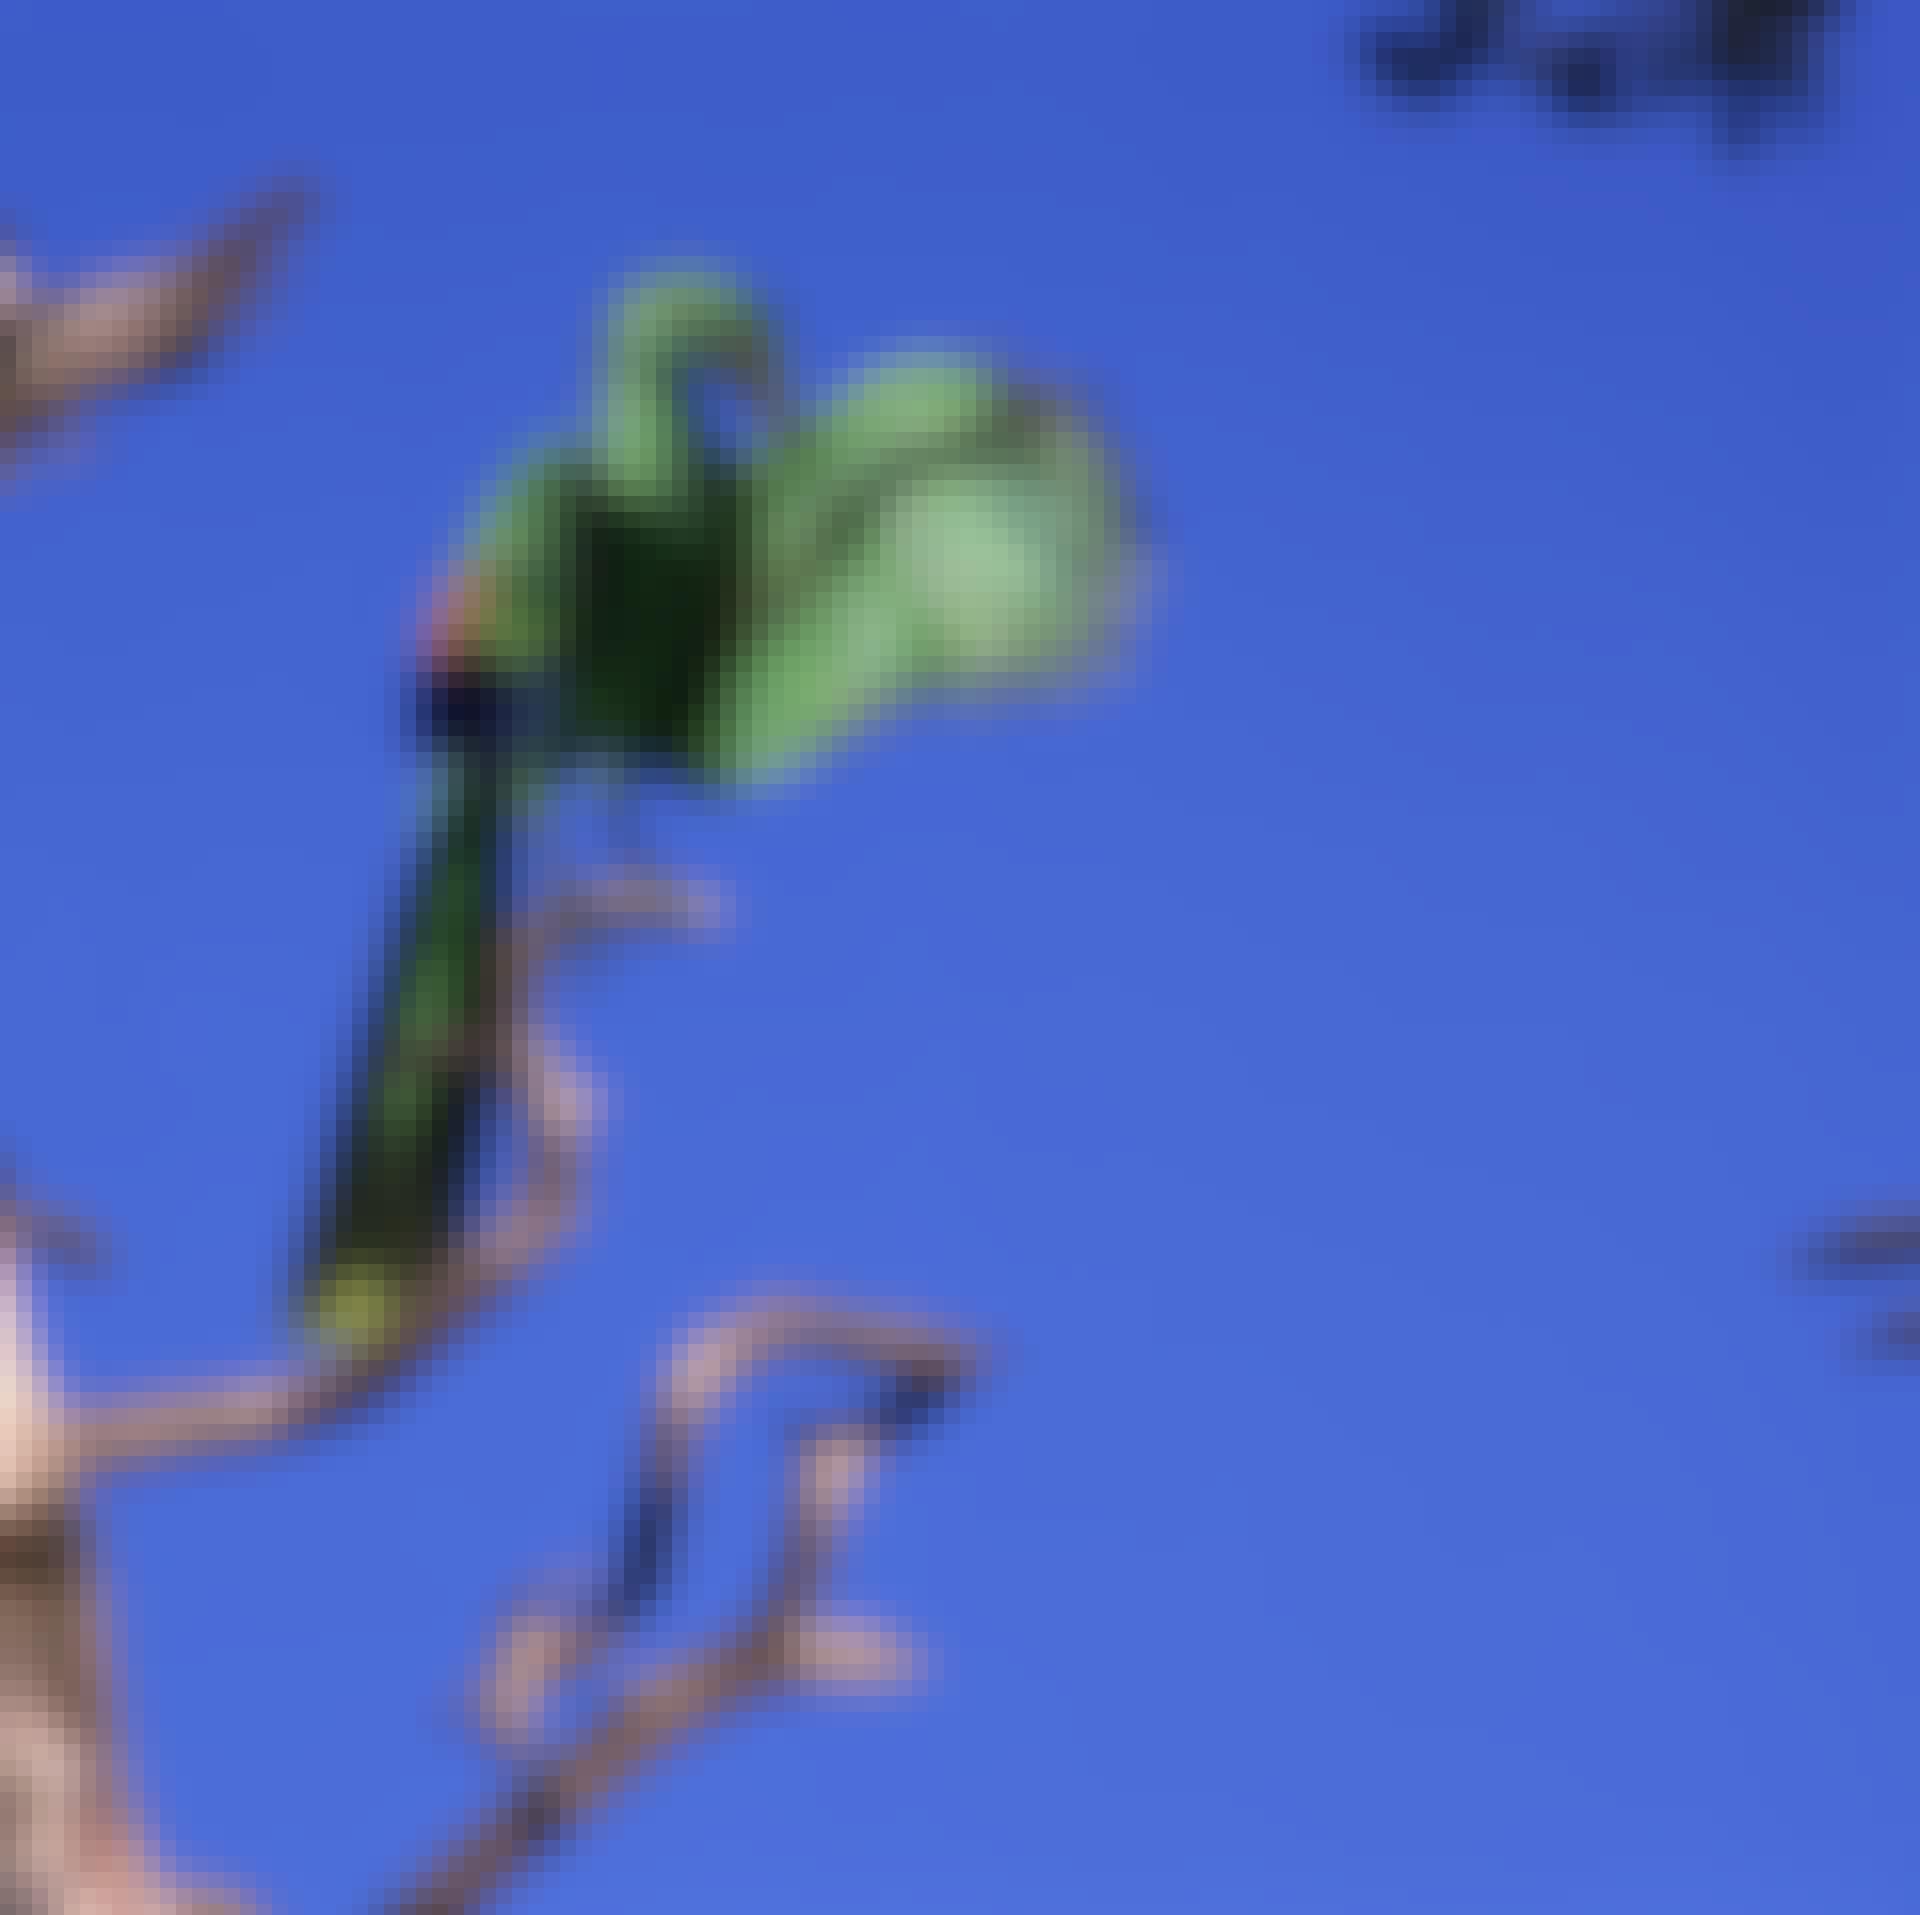 Archaeopteryx, verdens første fugl